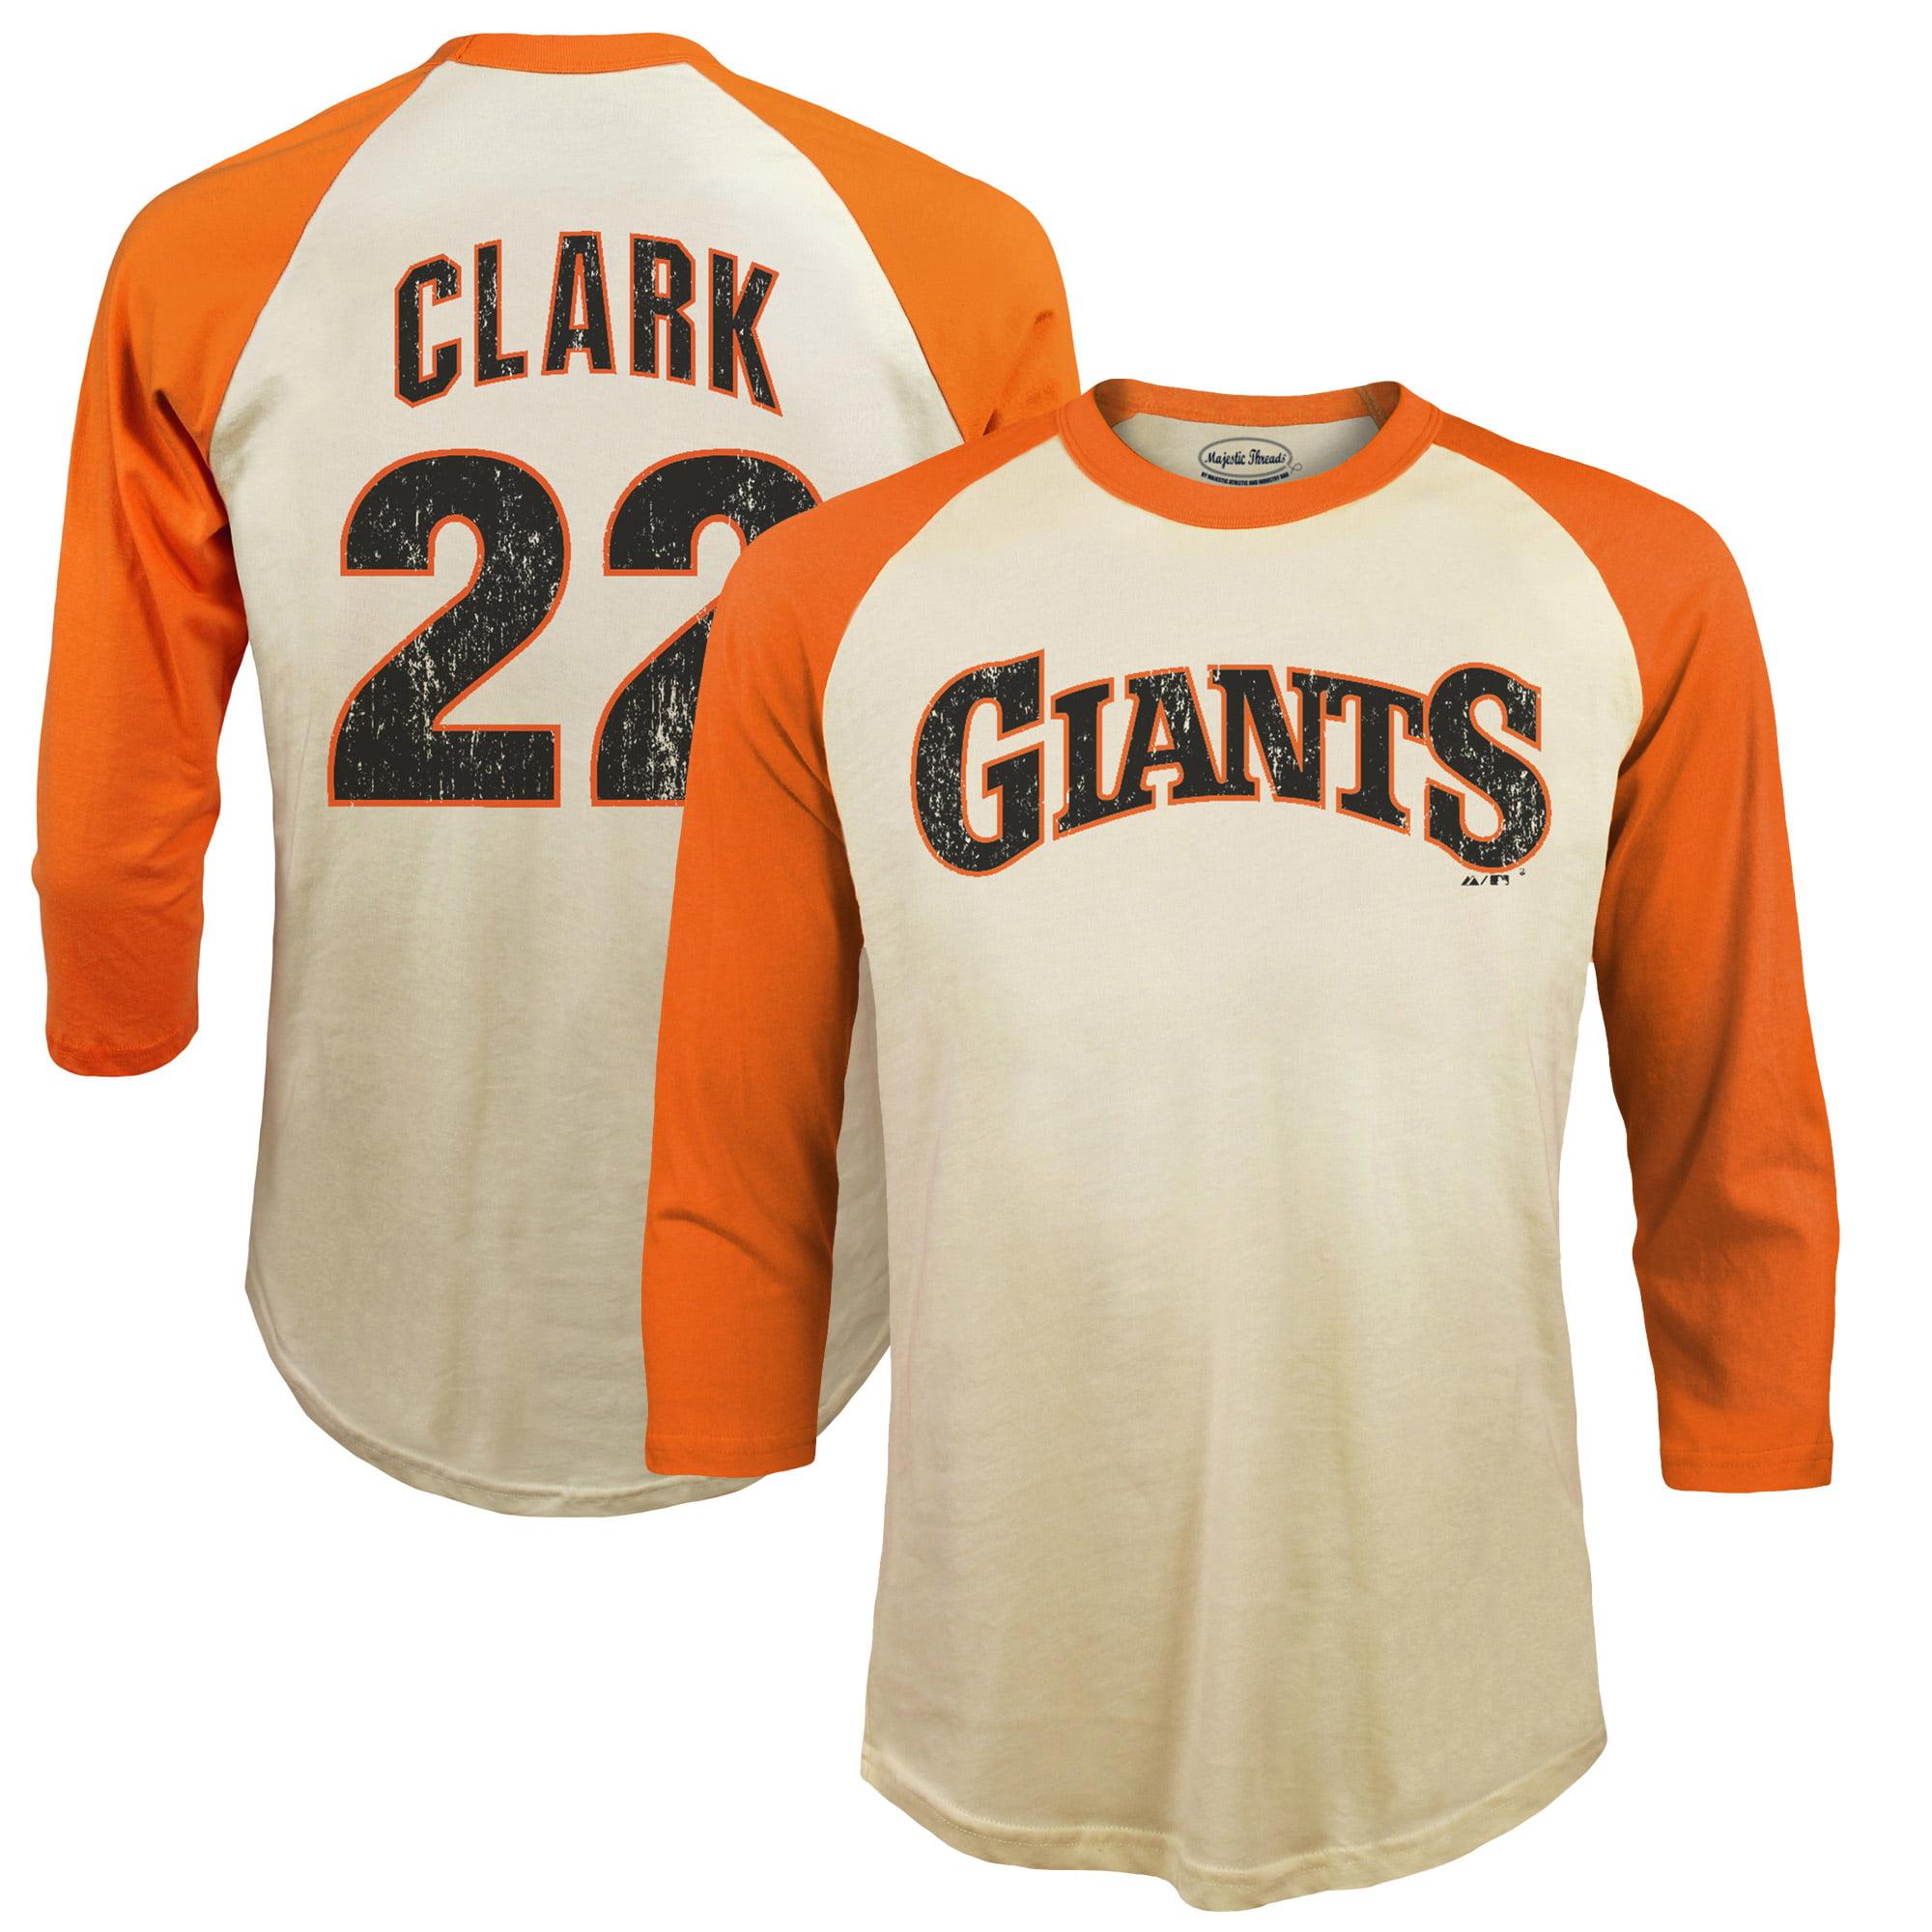 Will Clark San Francisco Giants Majestic Threads Softhand Cotton Cooperstown 3/4-Sleeve Raglan T-Shirt - Cream